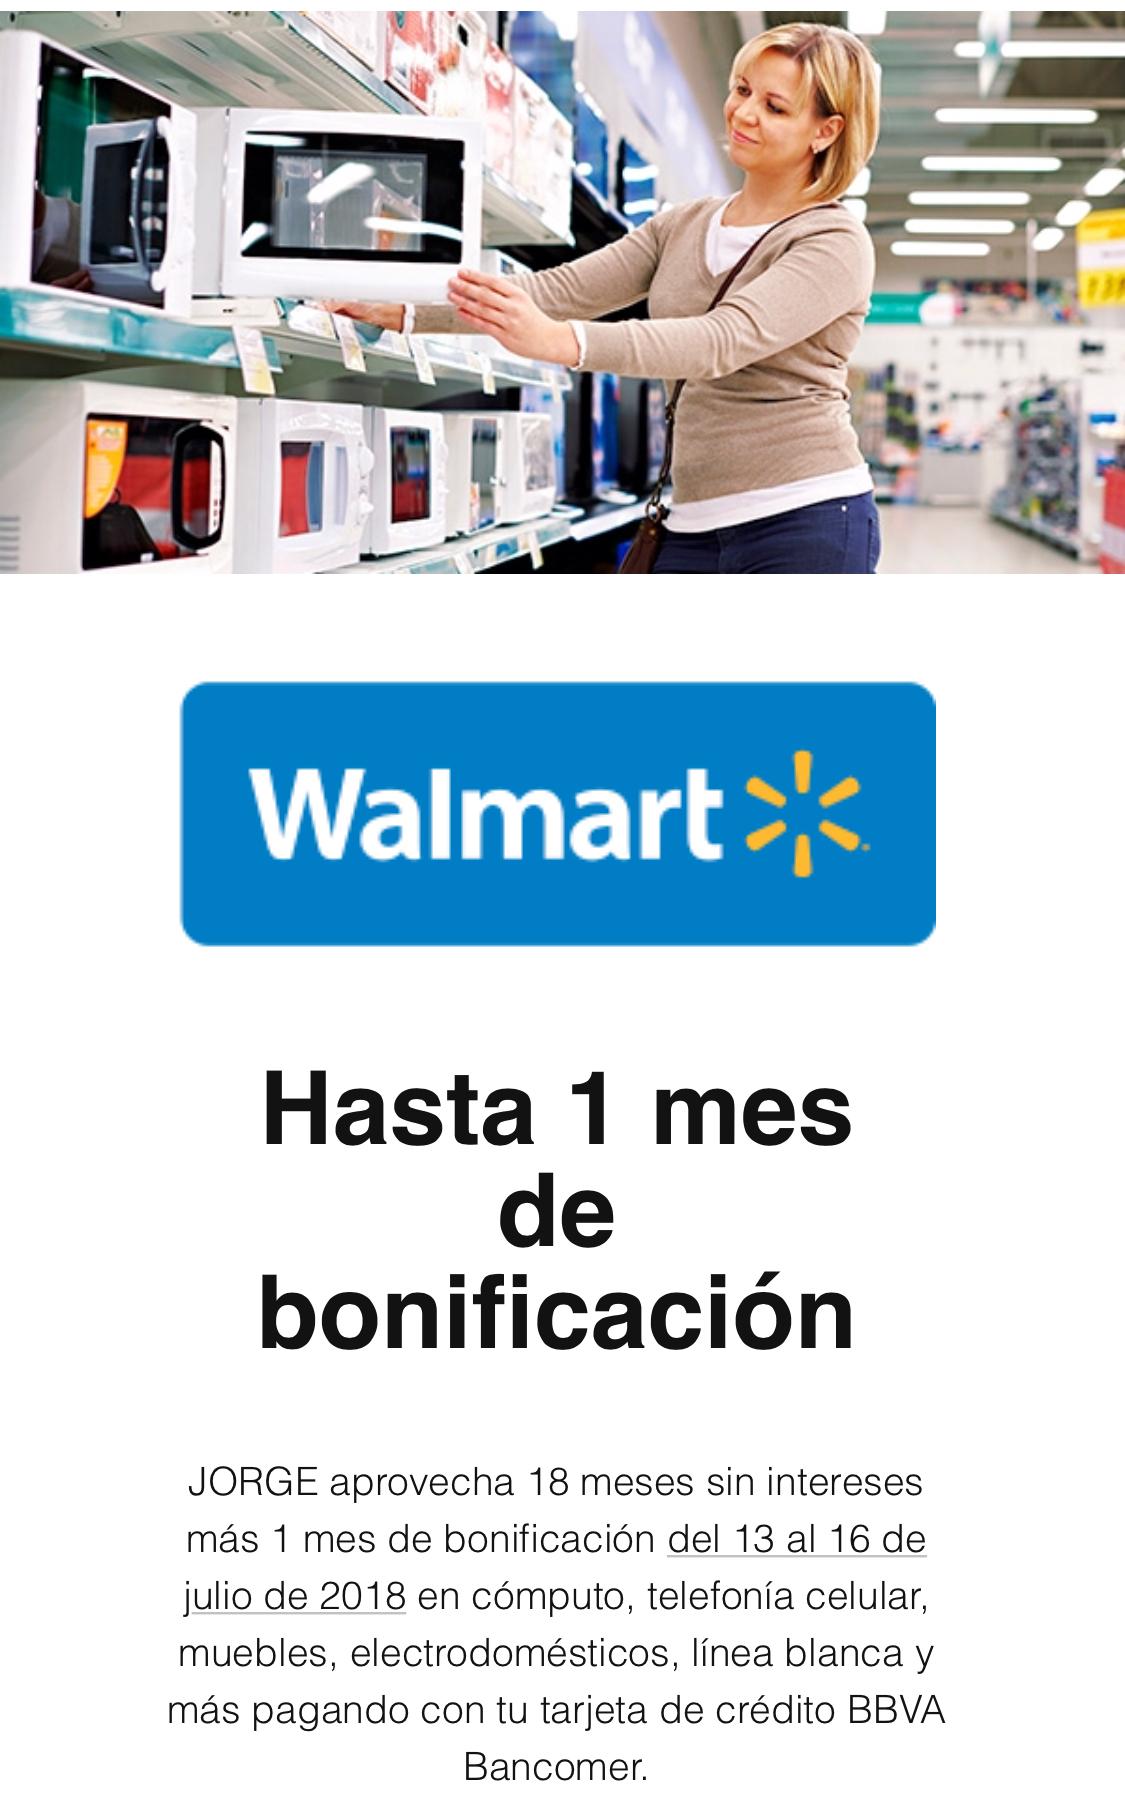 Walmart: 18 meses sin intereses + 1 mes de bonificación con Bancomer